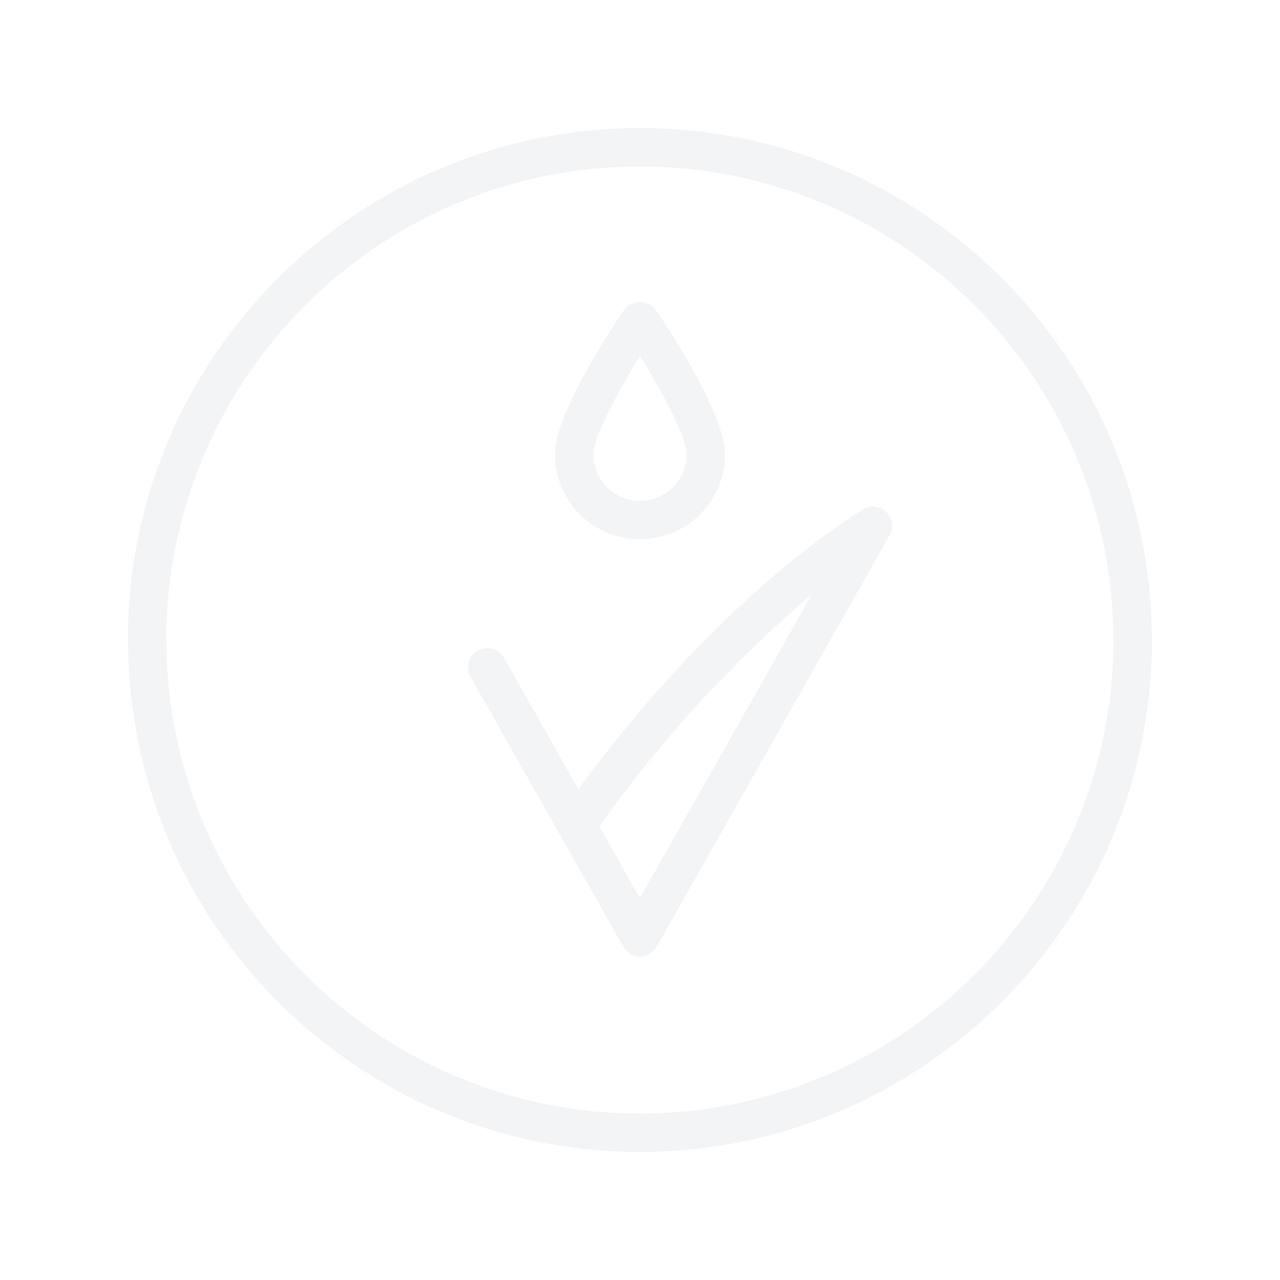 GOSH Brow Shape & Fill карандаш для бровей 2в1 0.5g